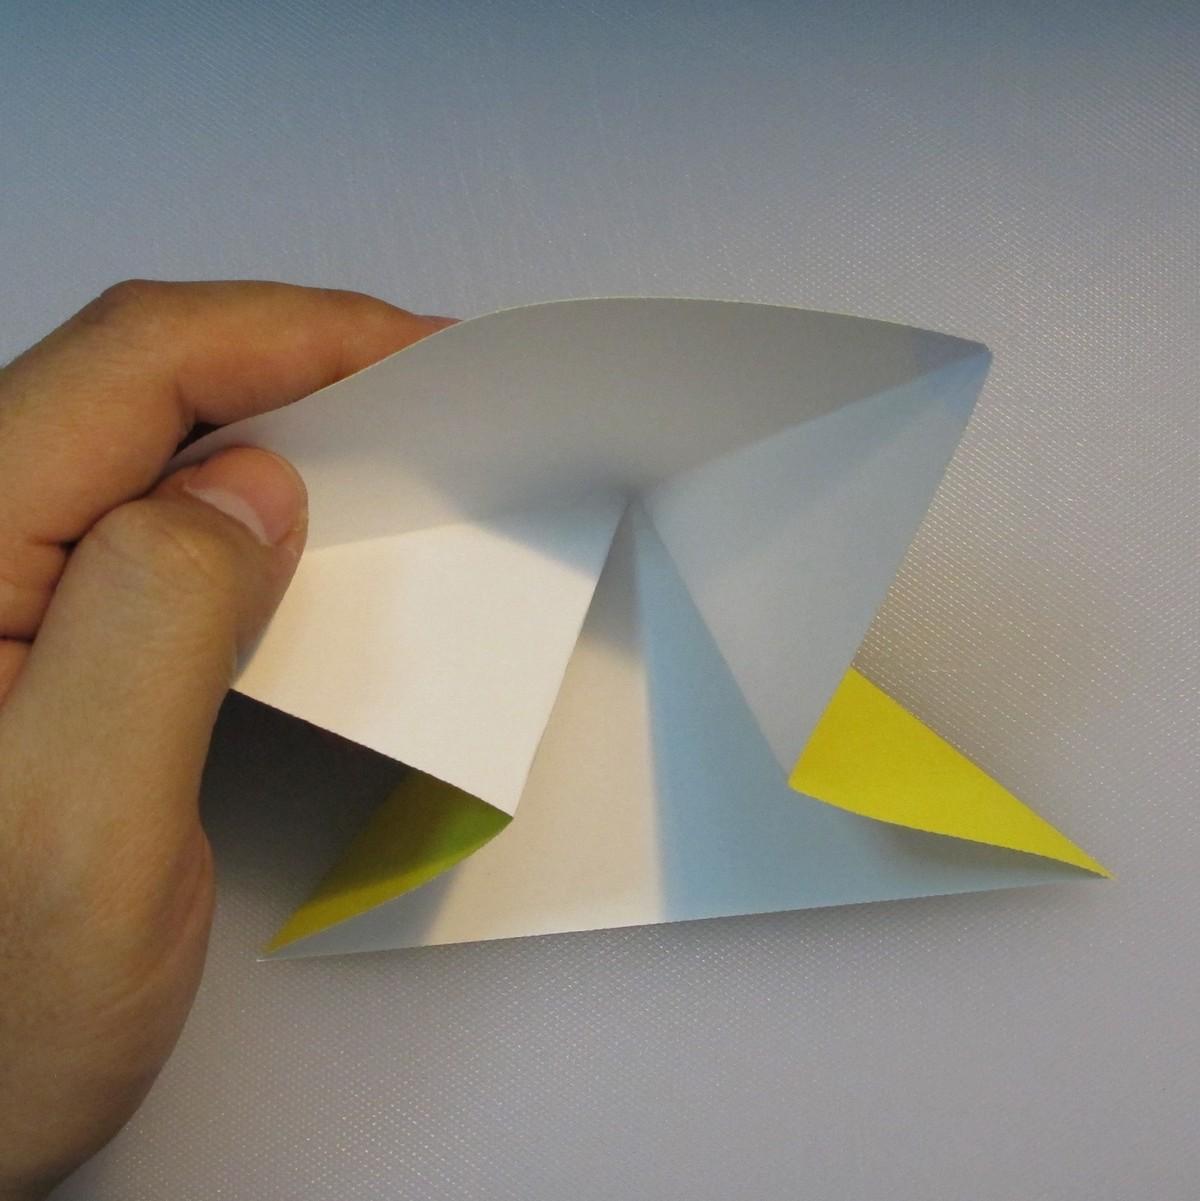 mookeep-วิธีพับกระดาษเป็นรูปปิกาจู-01-004